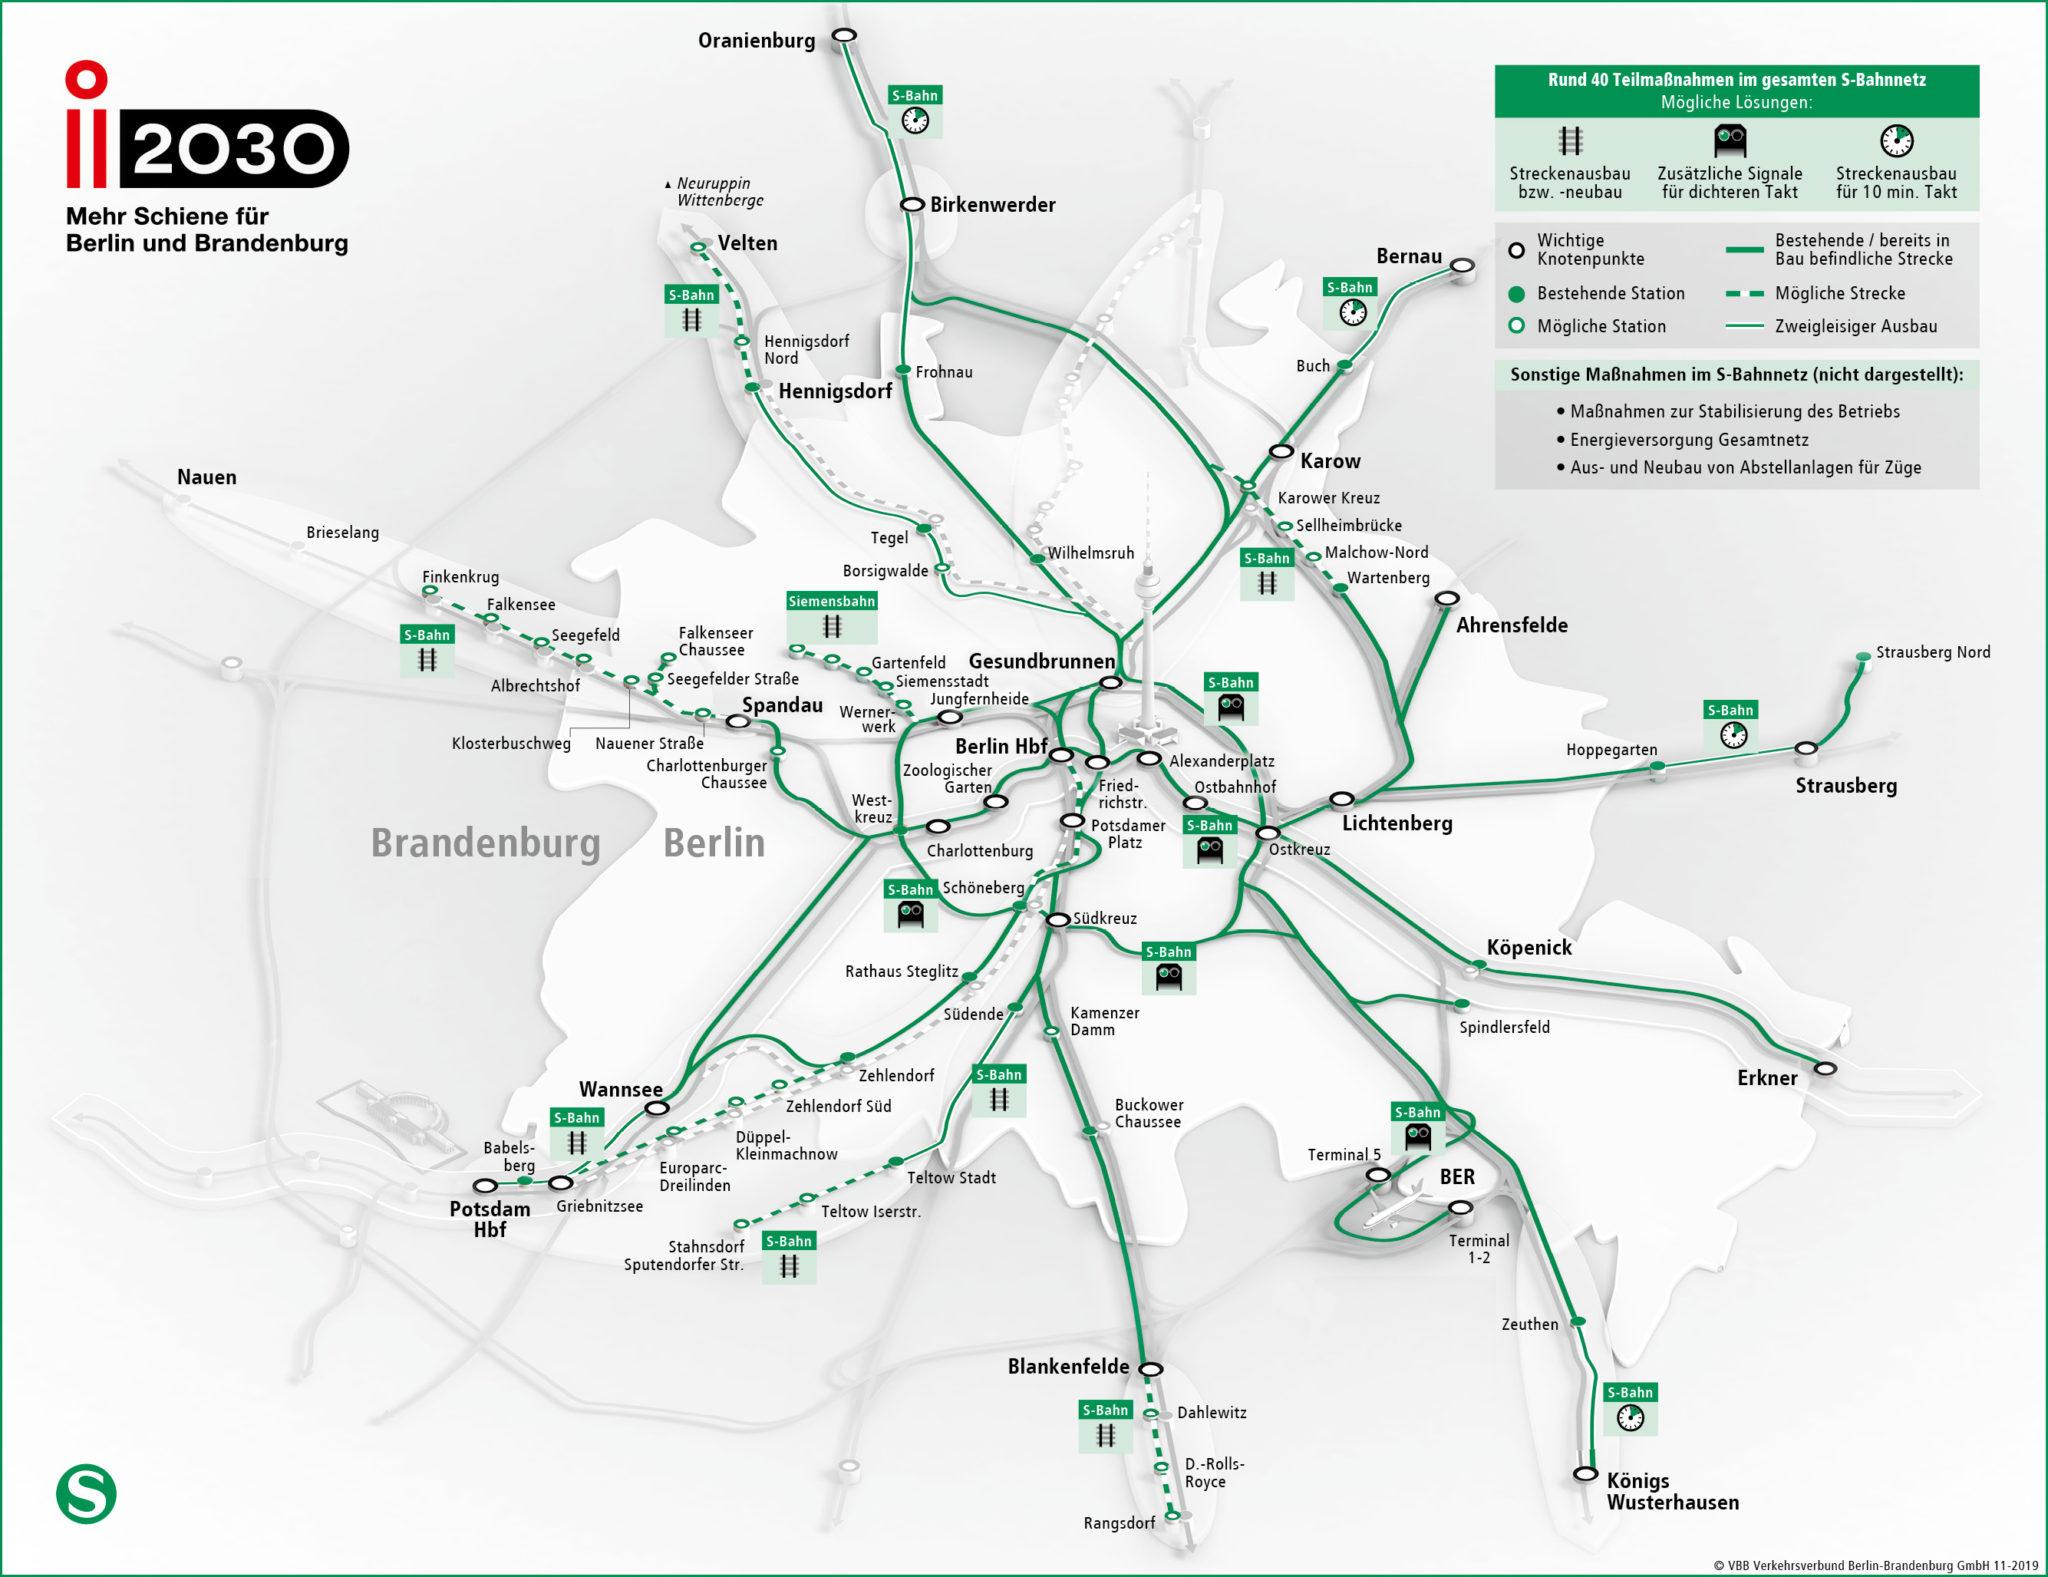 https://www.i2030.de/wp-content/uploads/2020/02/i2030-S-Bahn-RGB-11-2019-1-mit-Logo-2048x1577.jpg